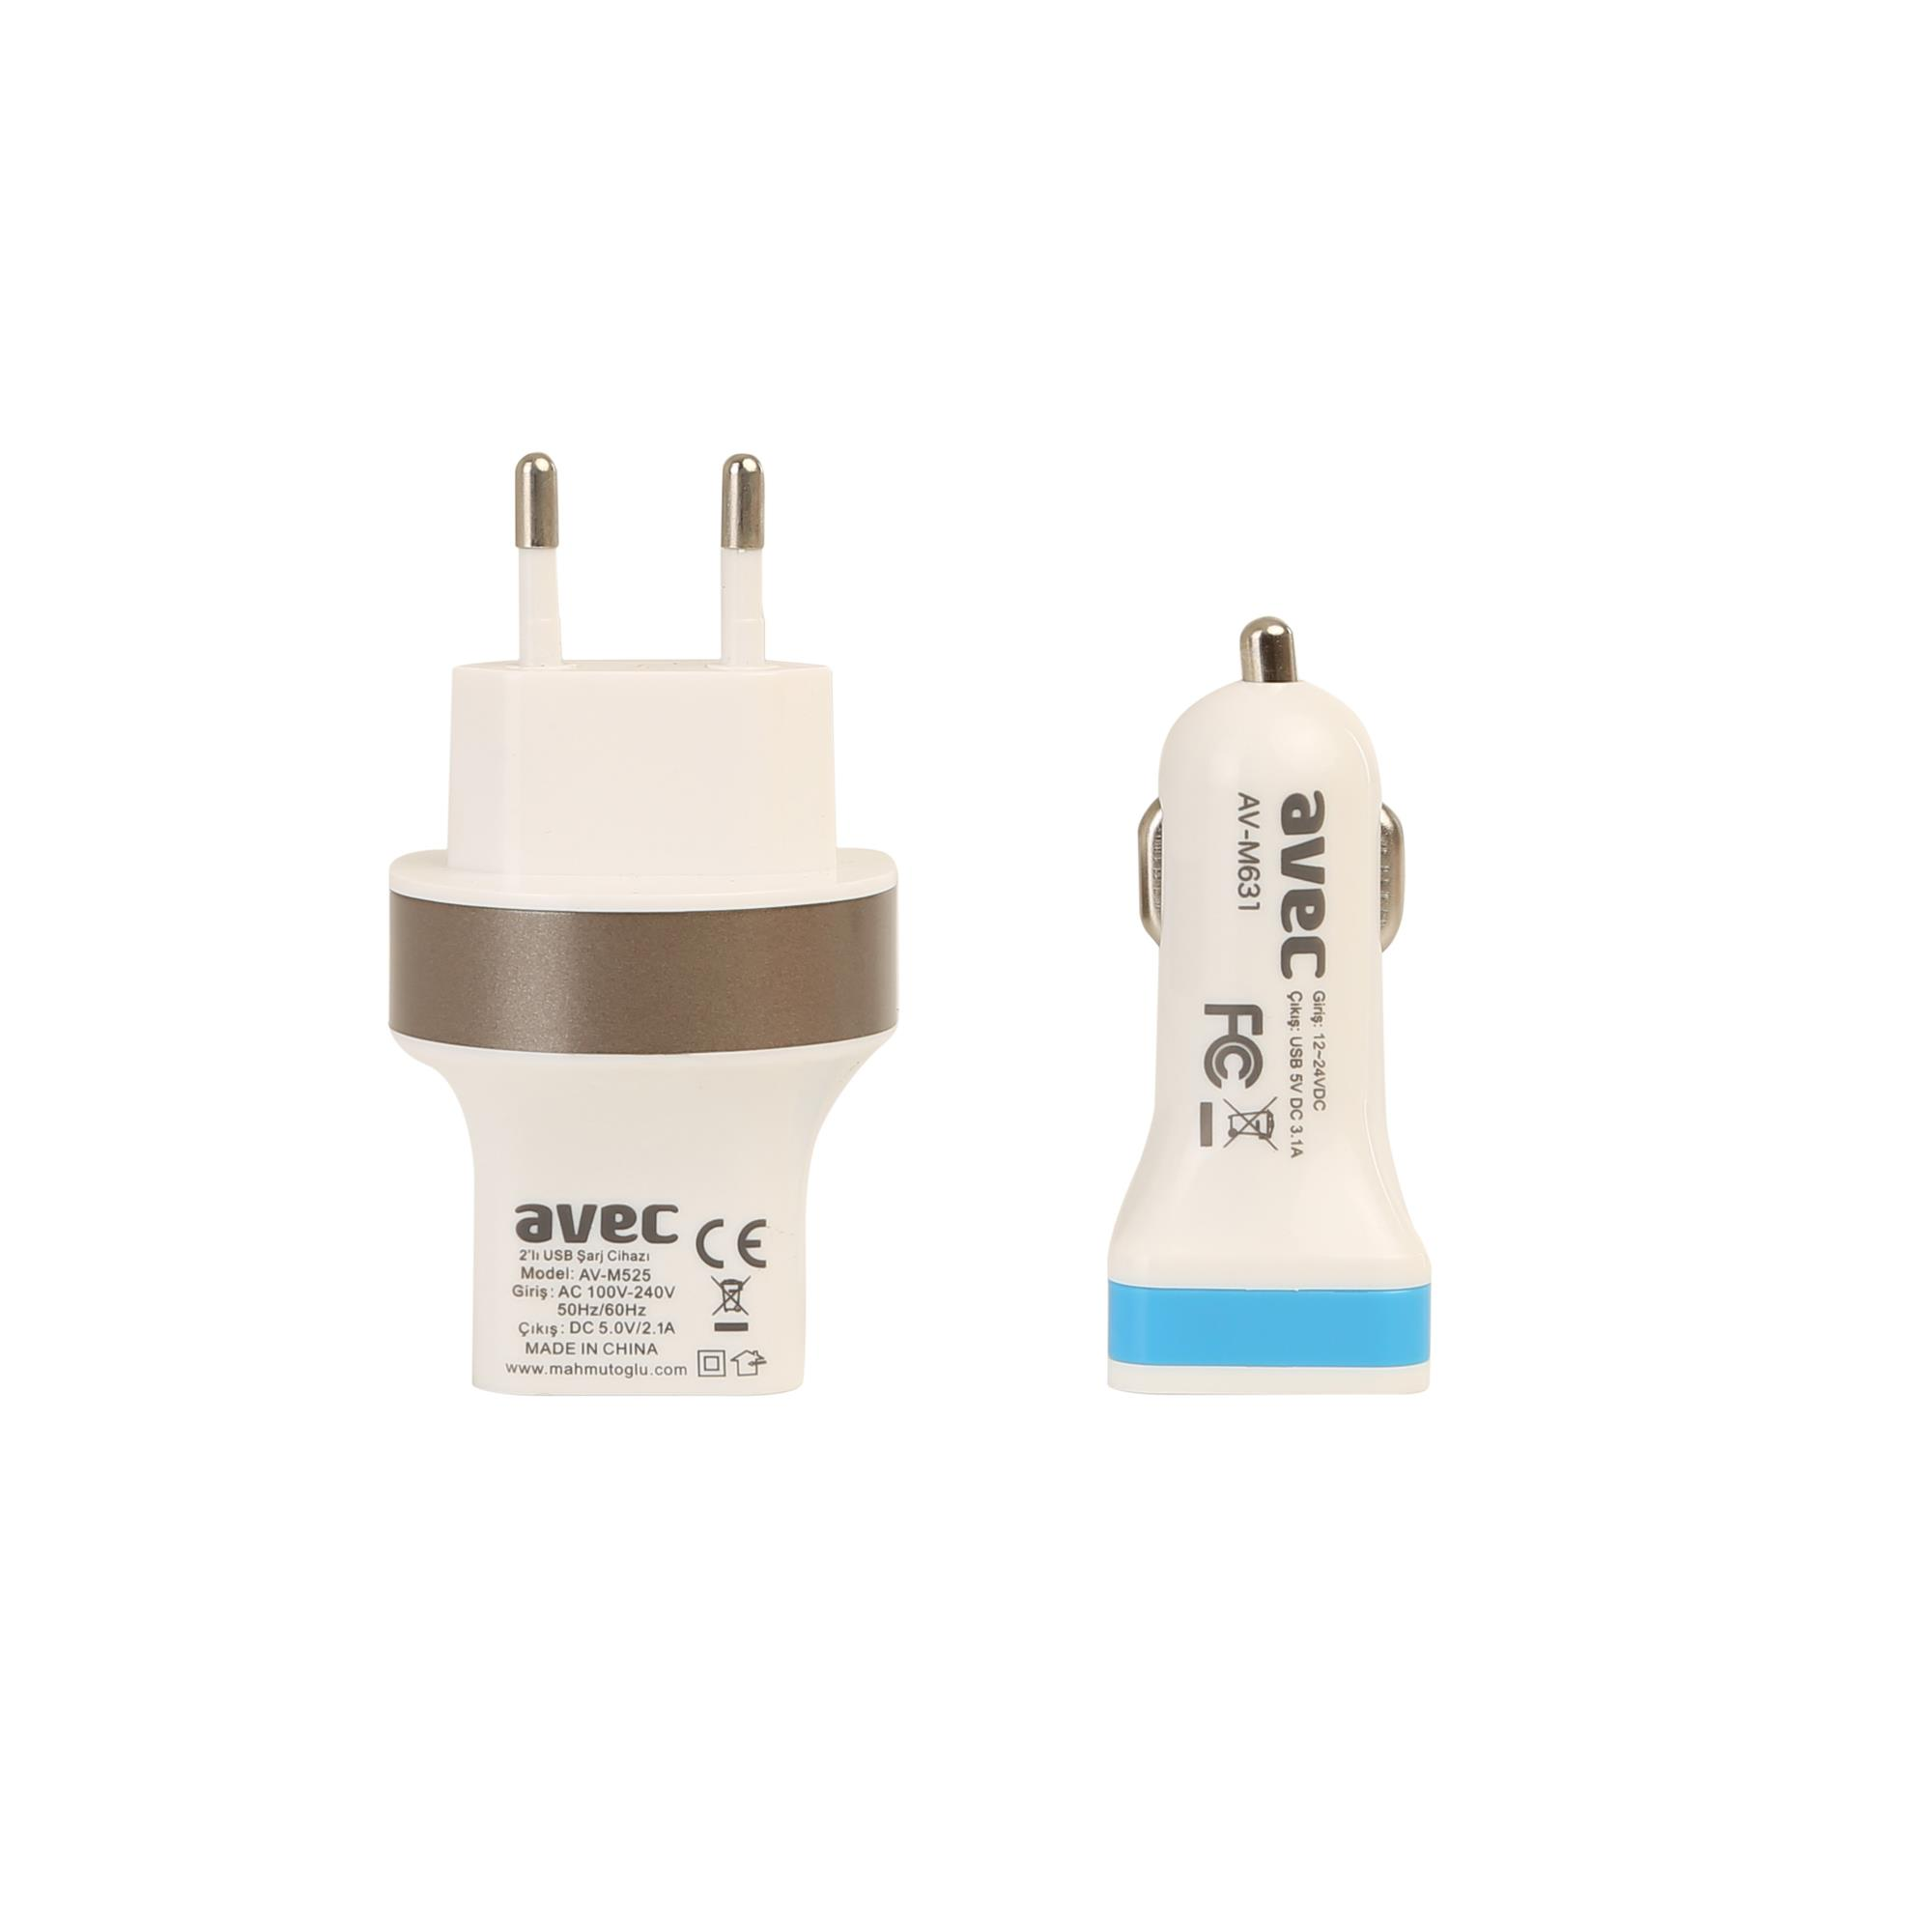 AVEC AV-M525 USB ŞARJ CİHAZI + AV-M631 ARAÇ ŞARJ CİHAZI + AV-W101 MİCRO USB KABLO SETİ